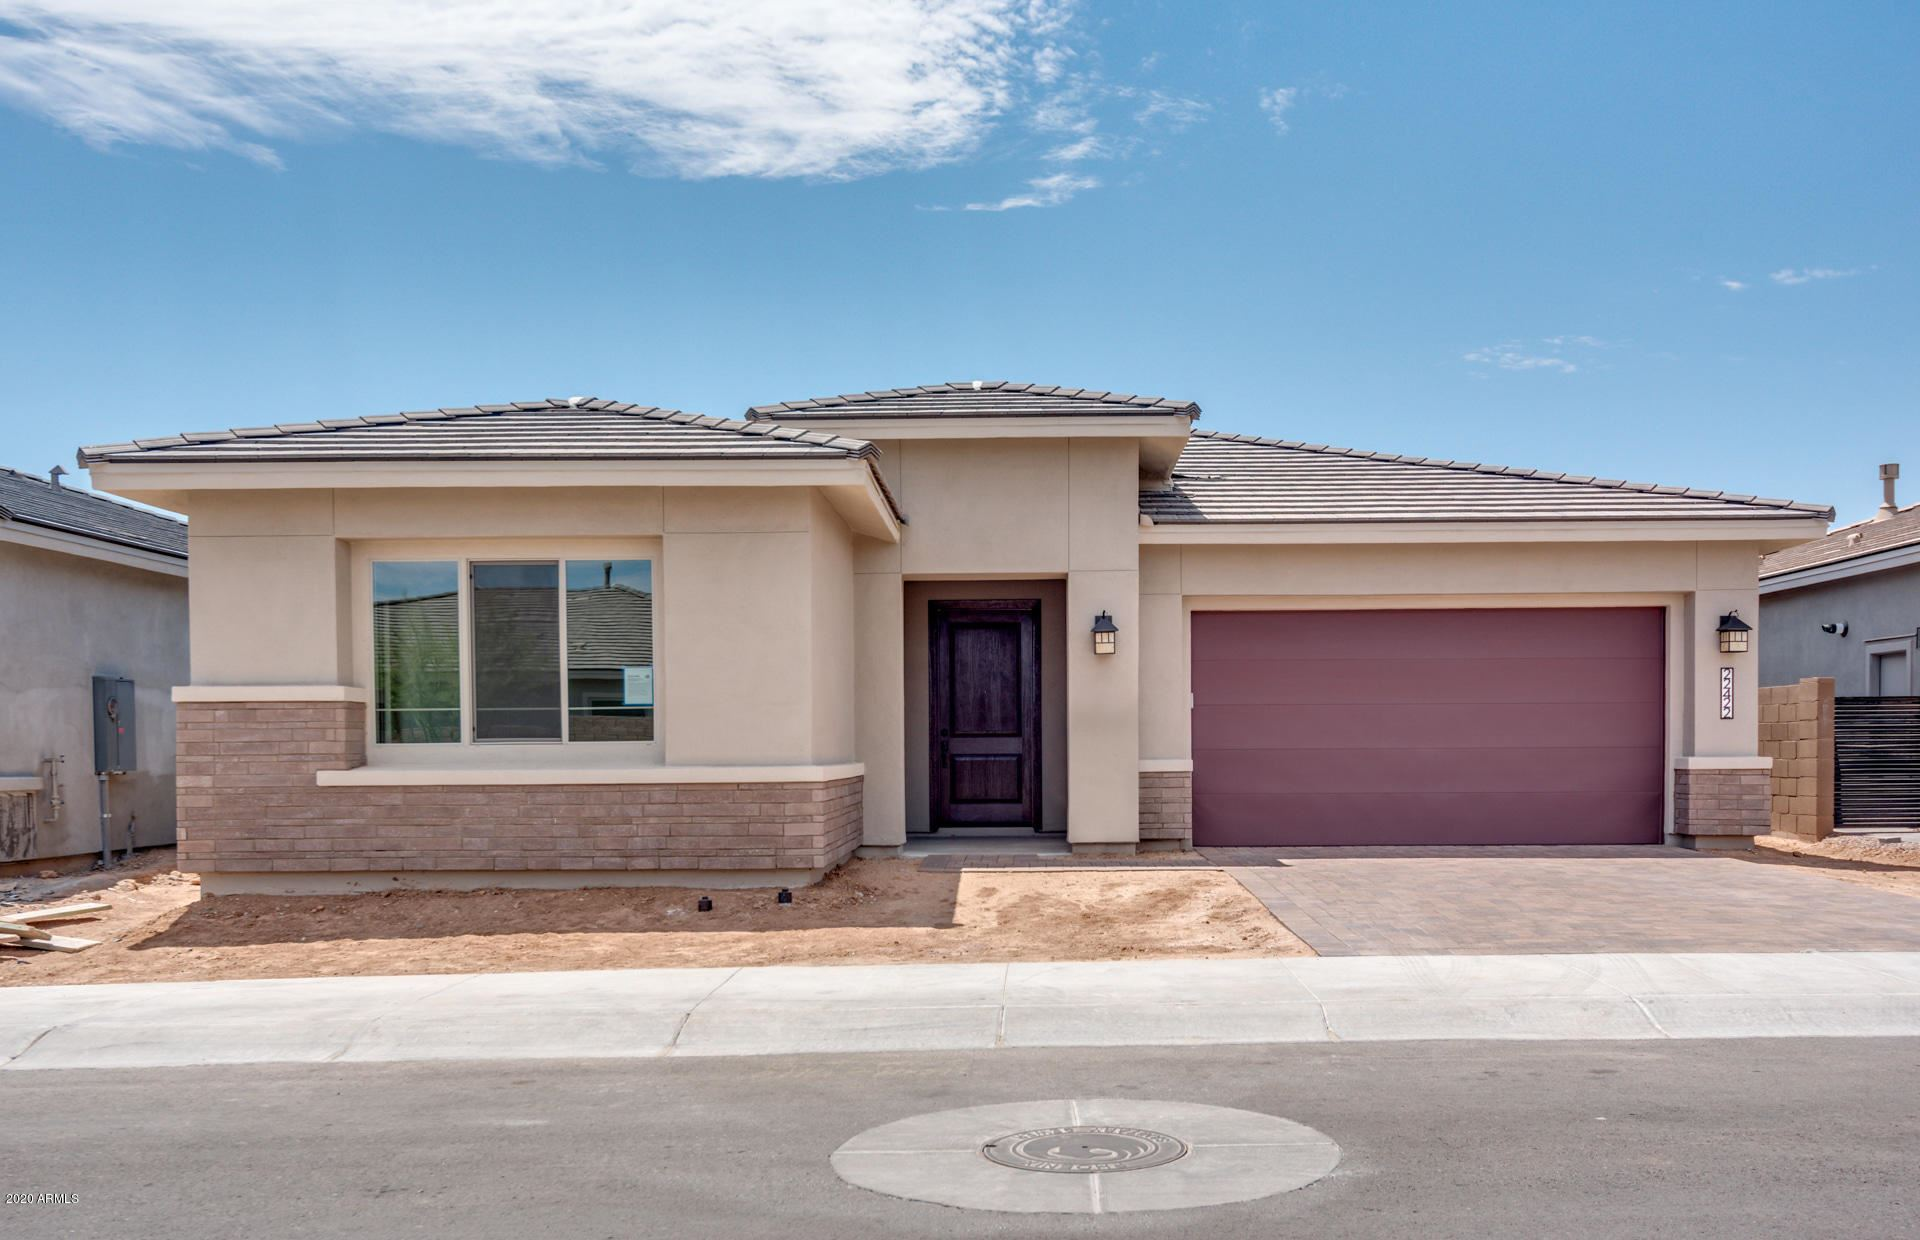 22422 N 28th Street, Phoenix, AZ 85050 - MLS#: 6053025